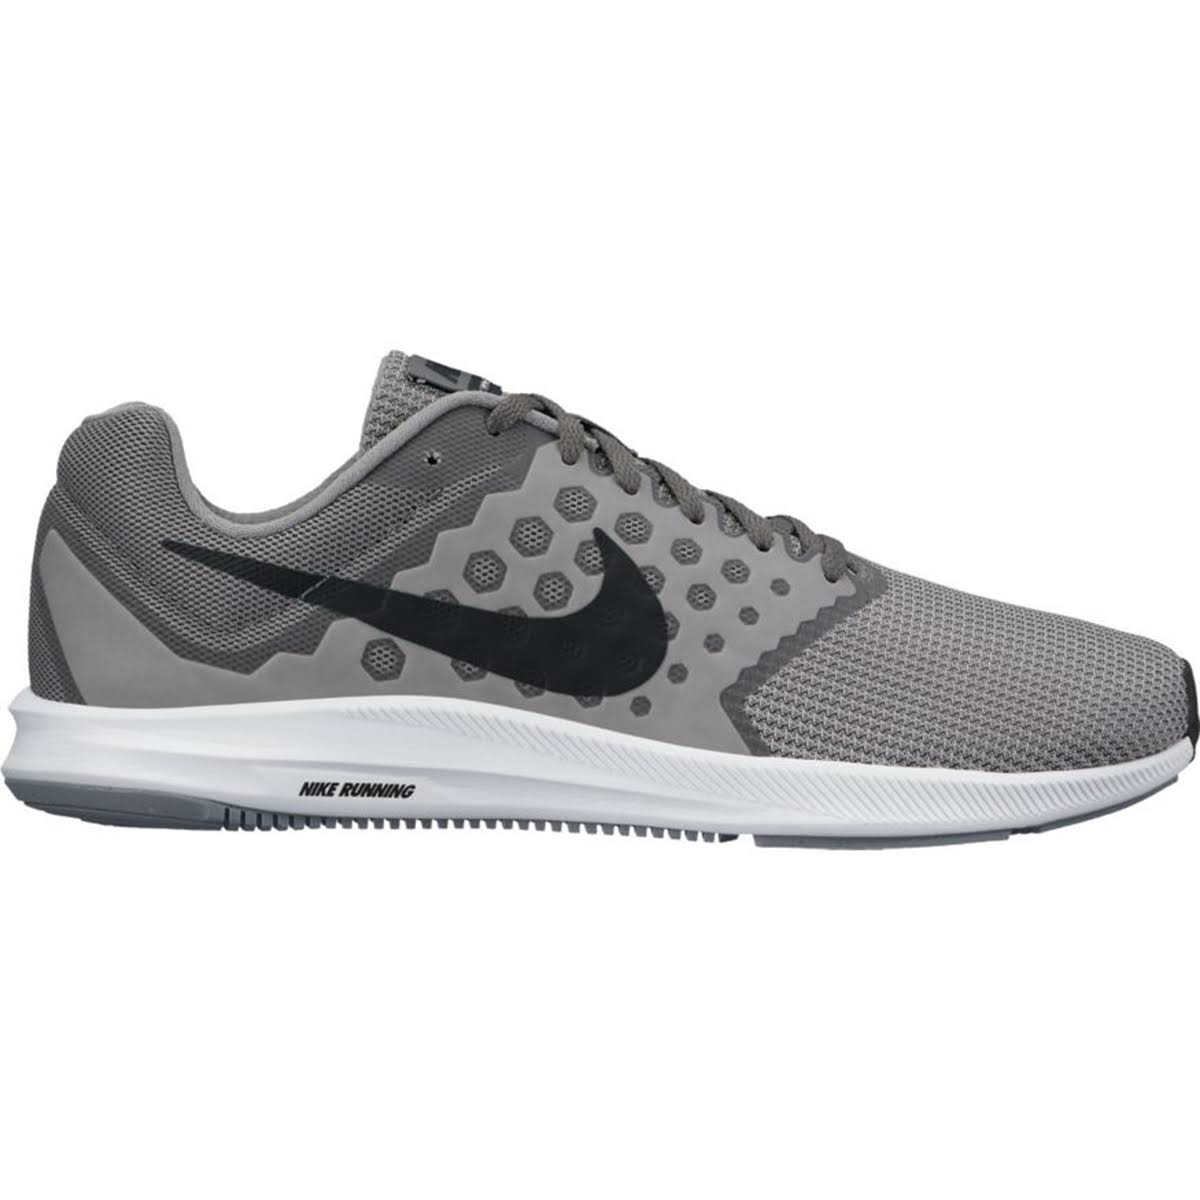 Nike Schwarz Medium 7 Männer Laufschuhe Downshifter 15 Grau Stealth rOqrX8